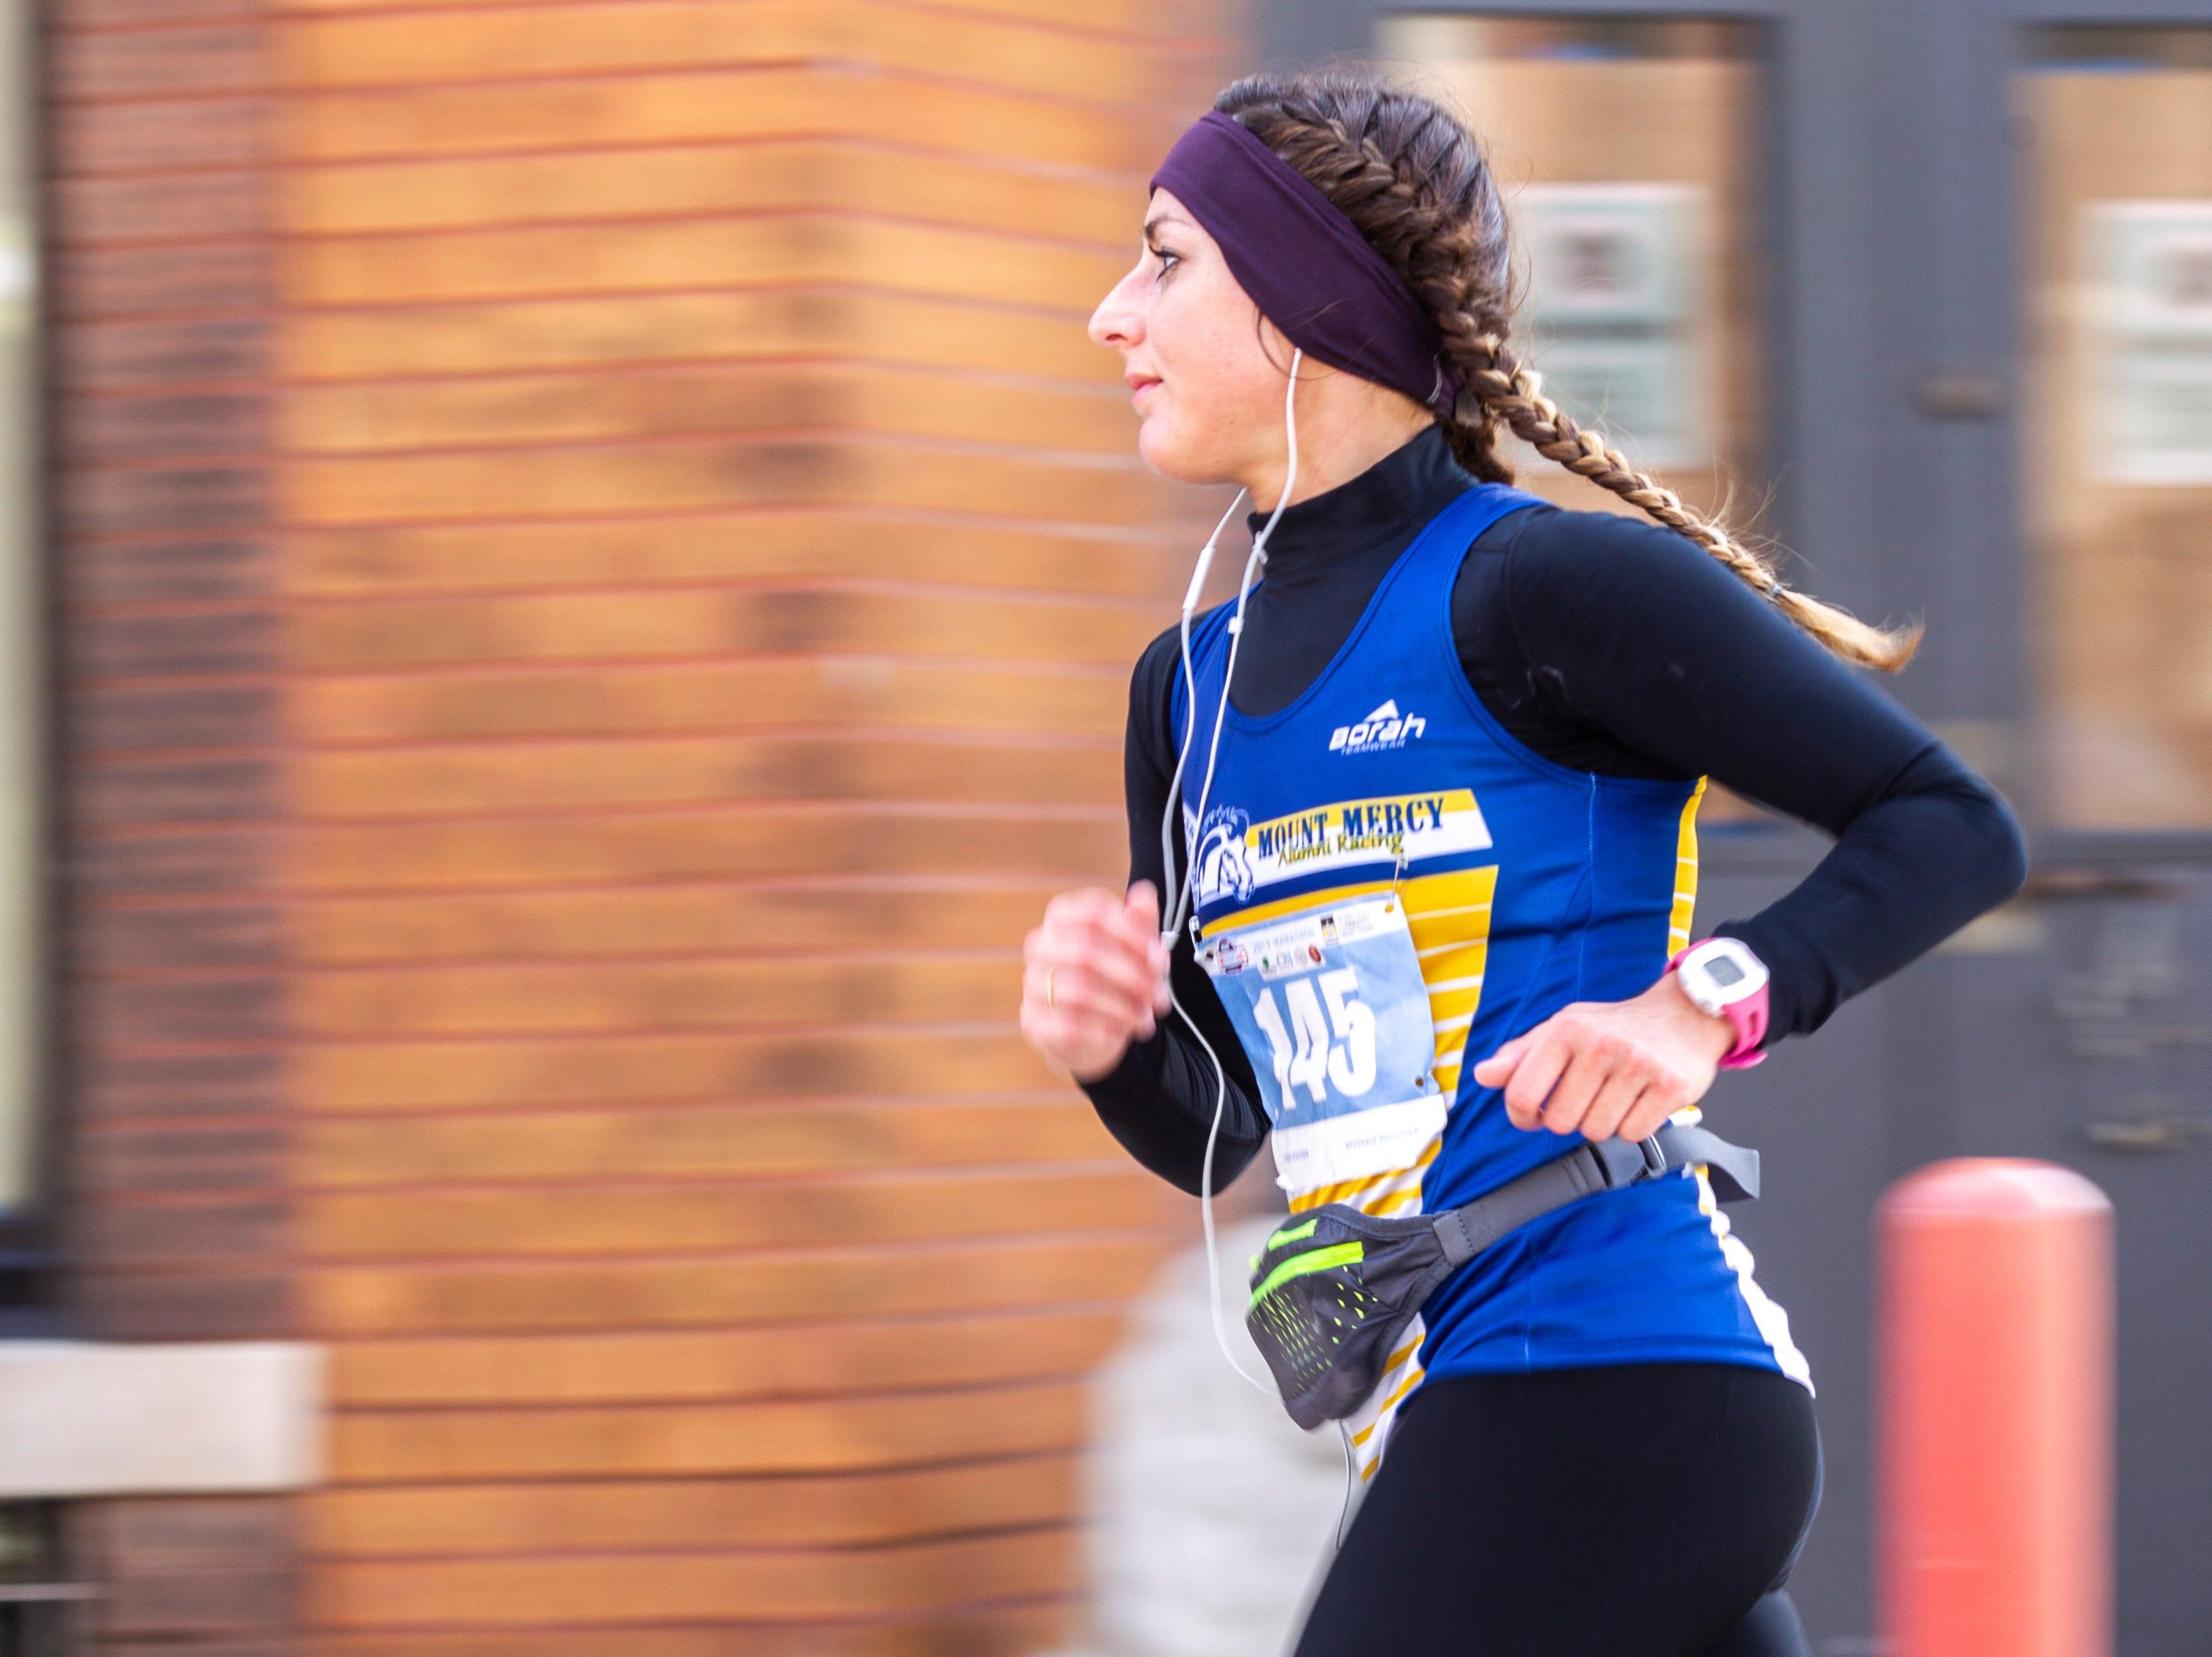 Katie Hoffert makes the final turn towards the finish line during the second annual Run CRANDIC marathon, Sunday, April 28, 2019, along 16th Avenue SE in Cedar Rapids, Iowa.